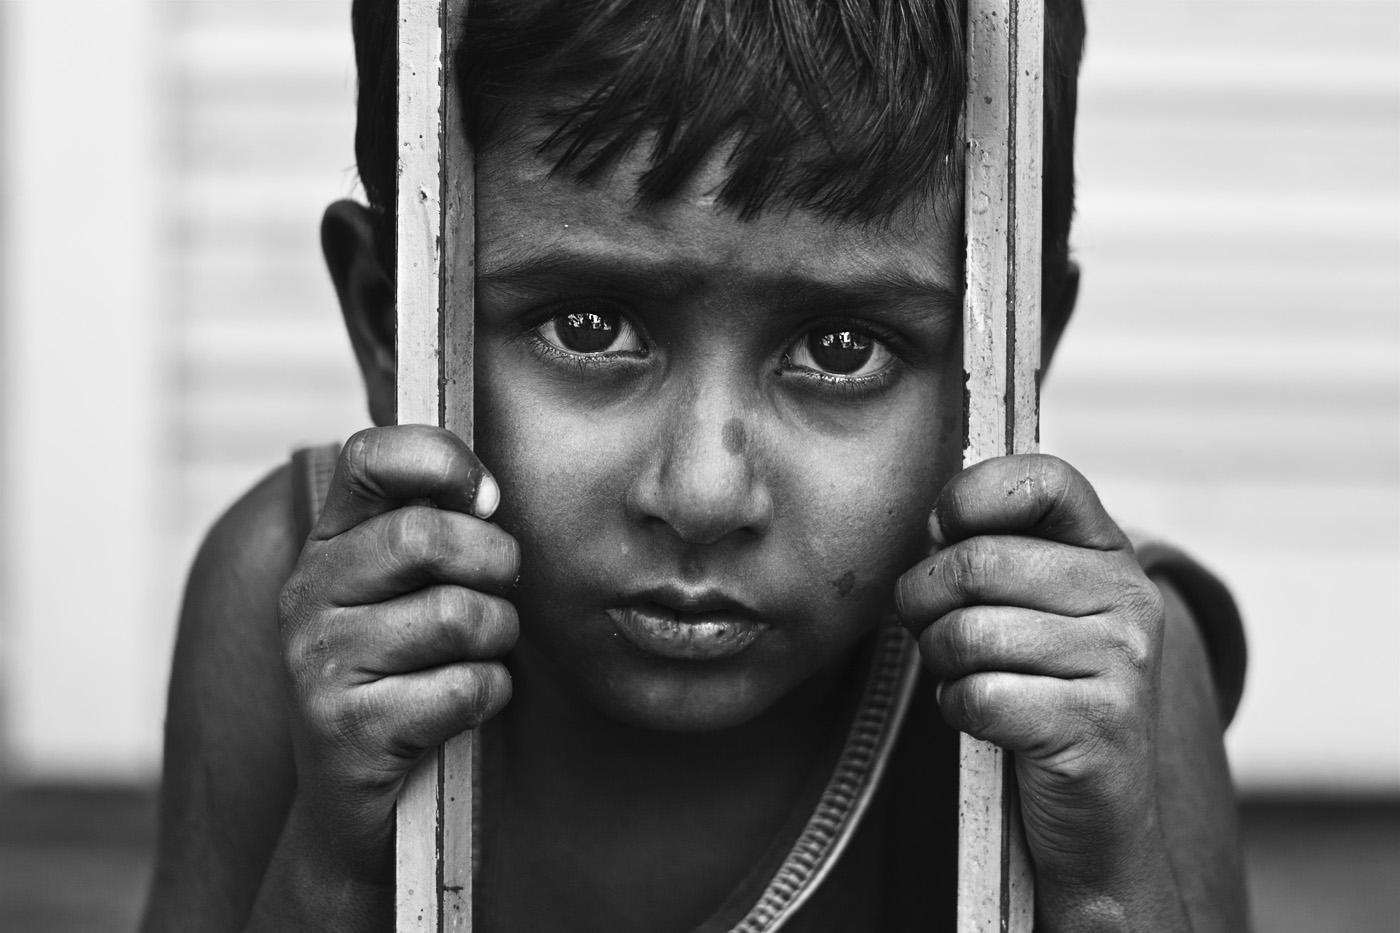 Flickr / Zuhair A. Al-Traifi